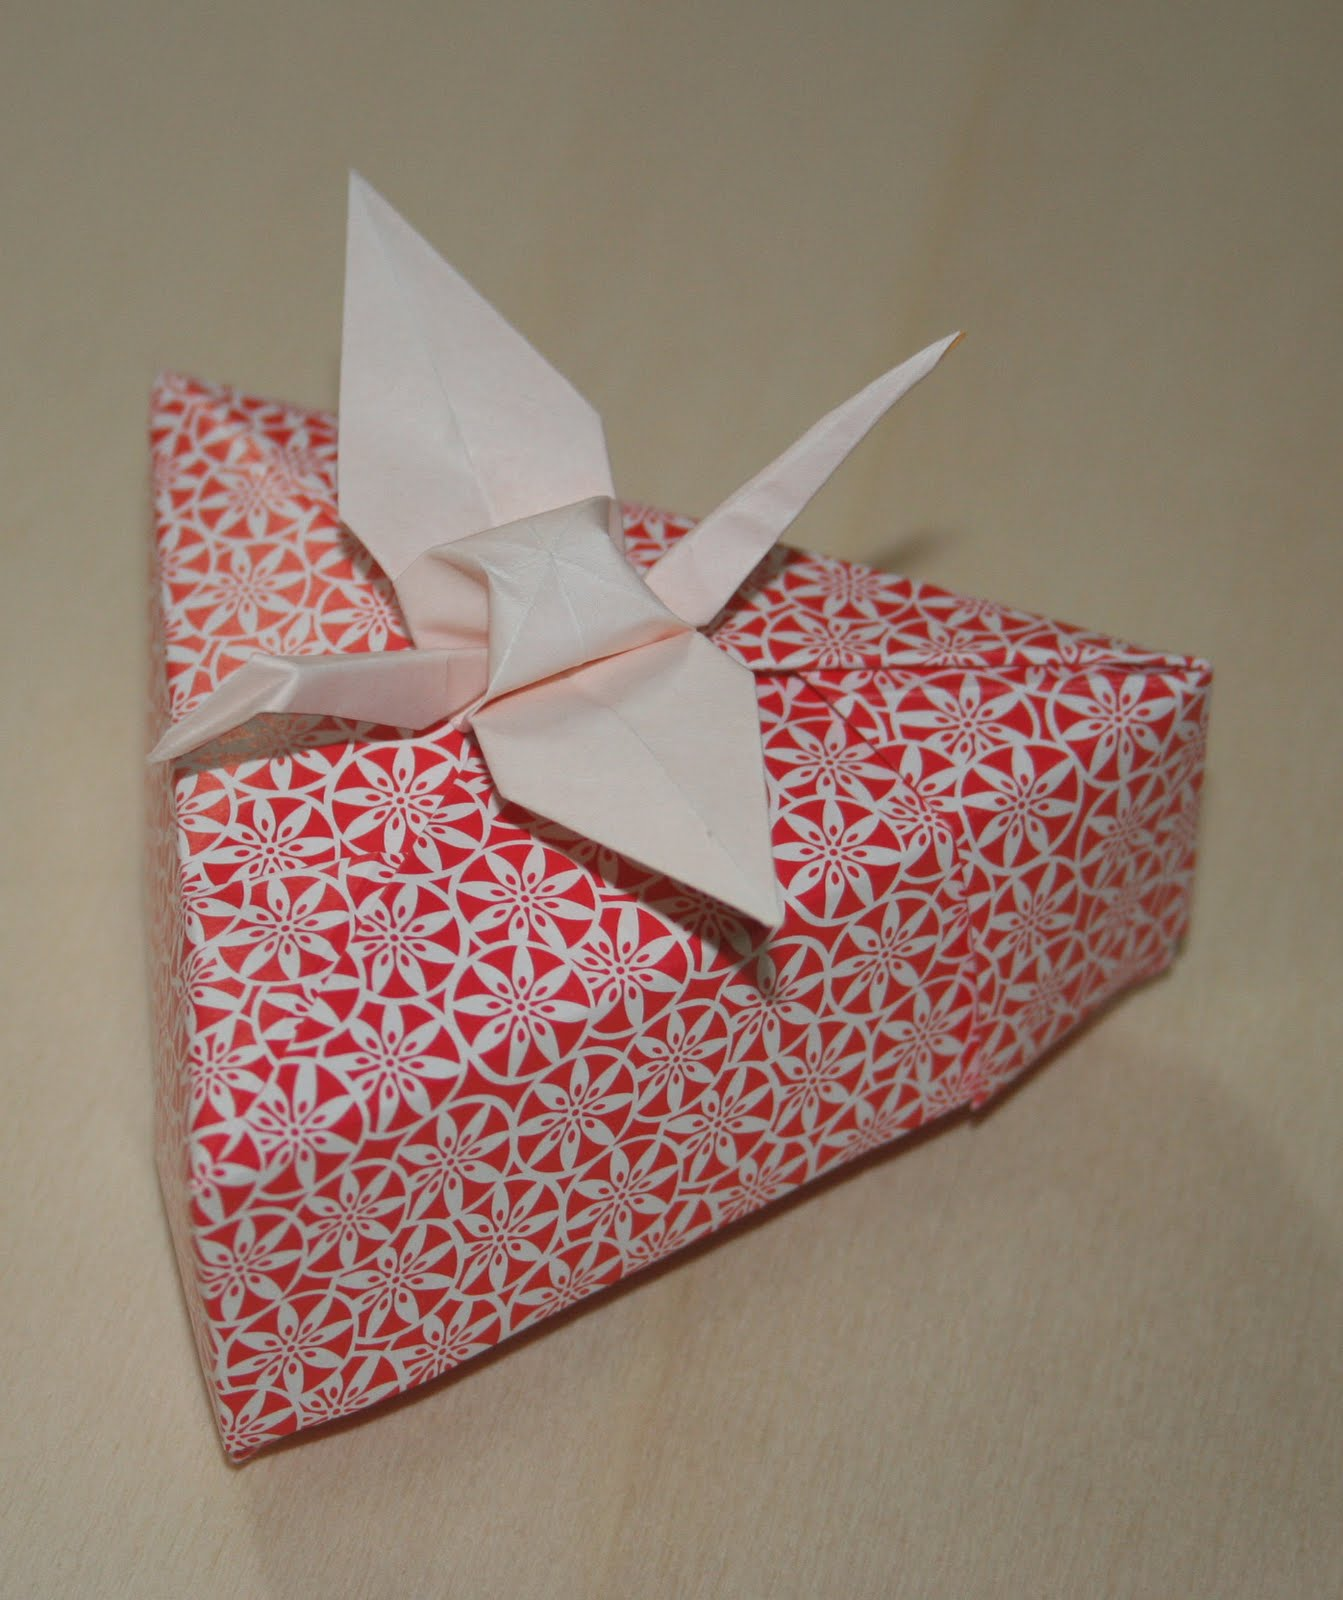 ORIGAMI CONSTRUCTIONS: heptagonal origami box + folding ... - photo#47